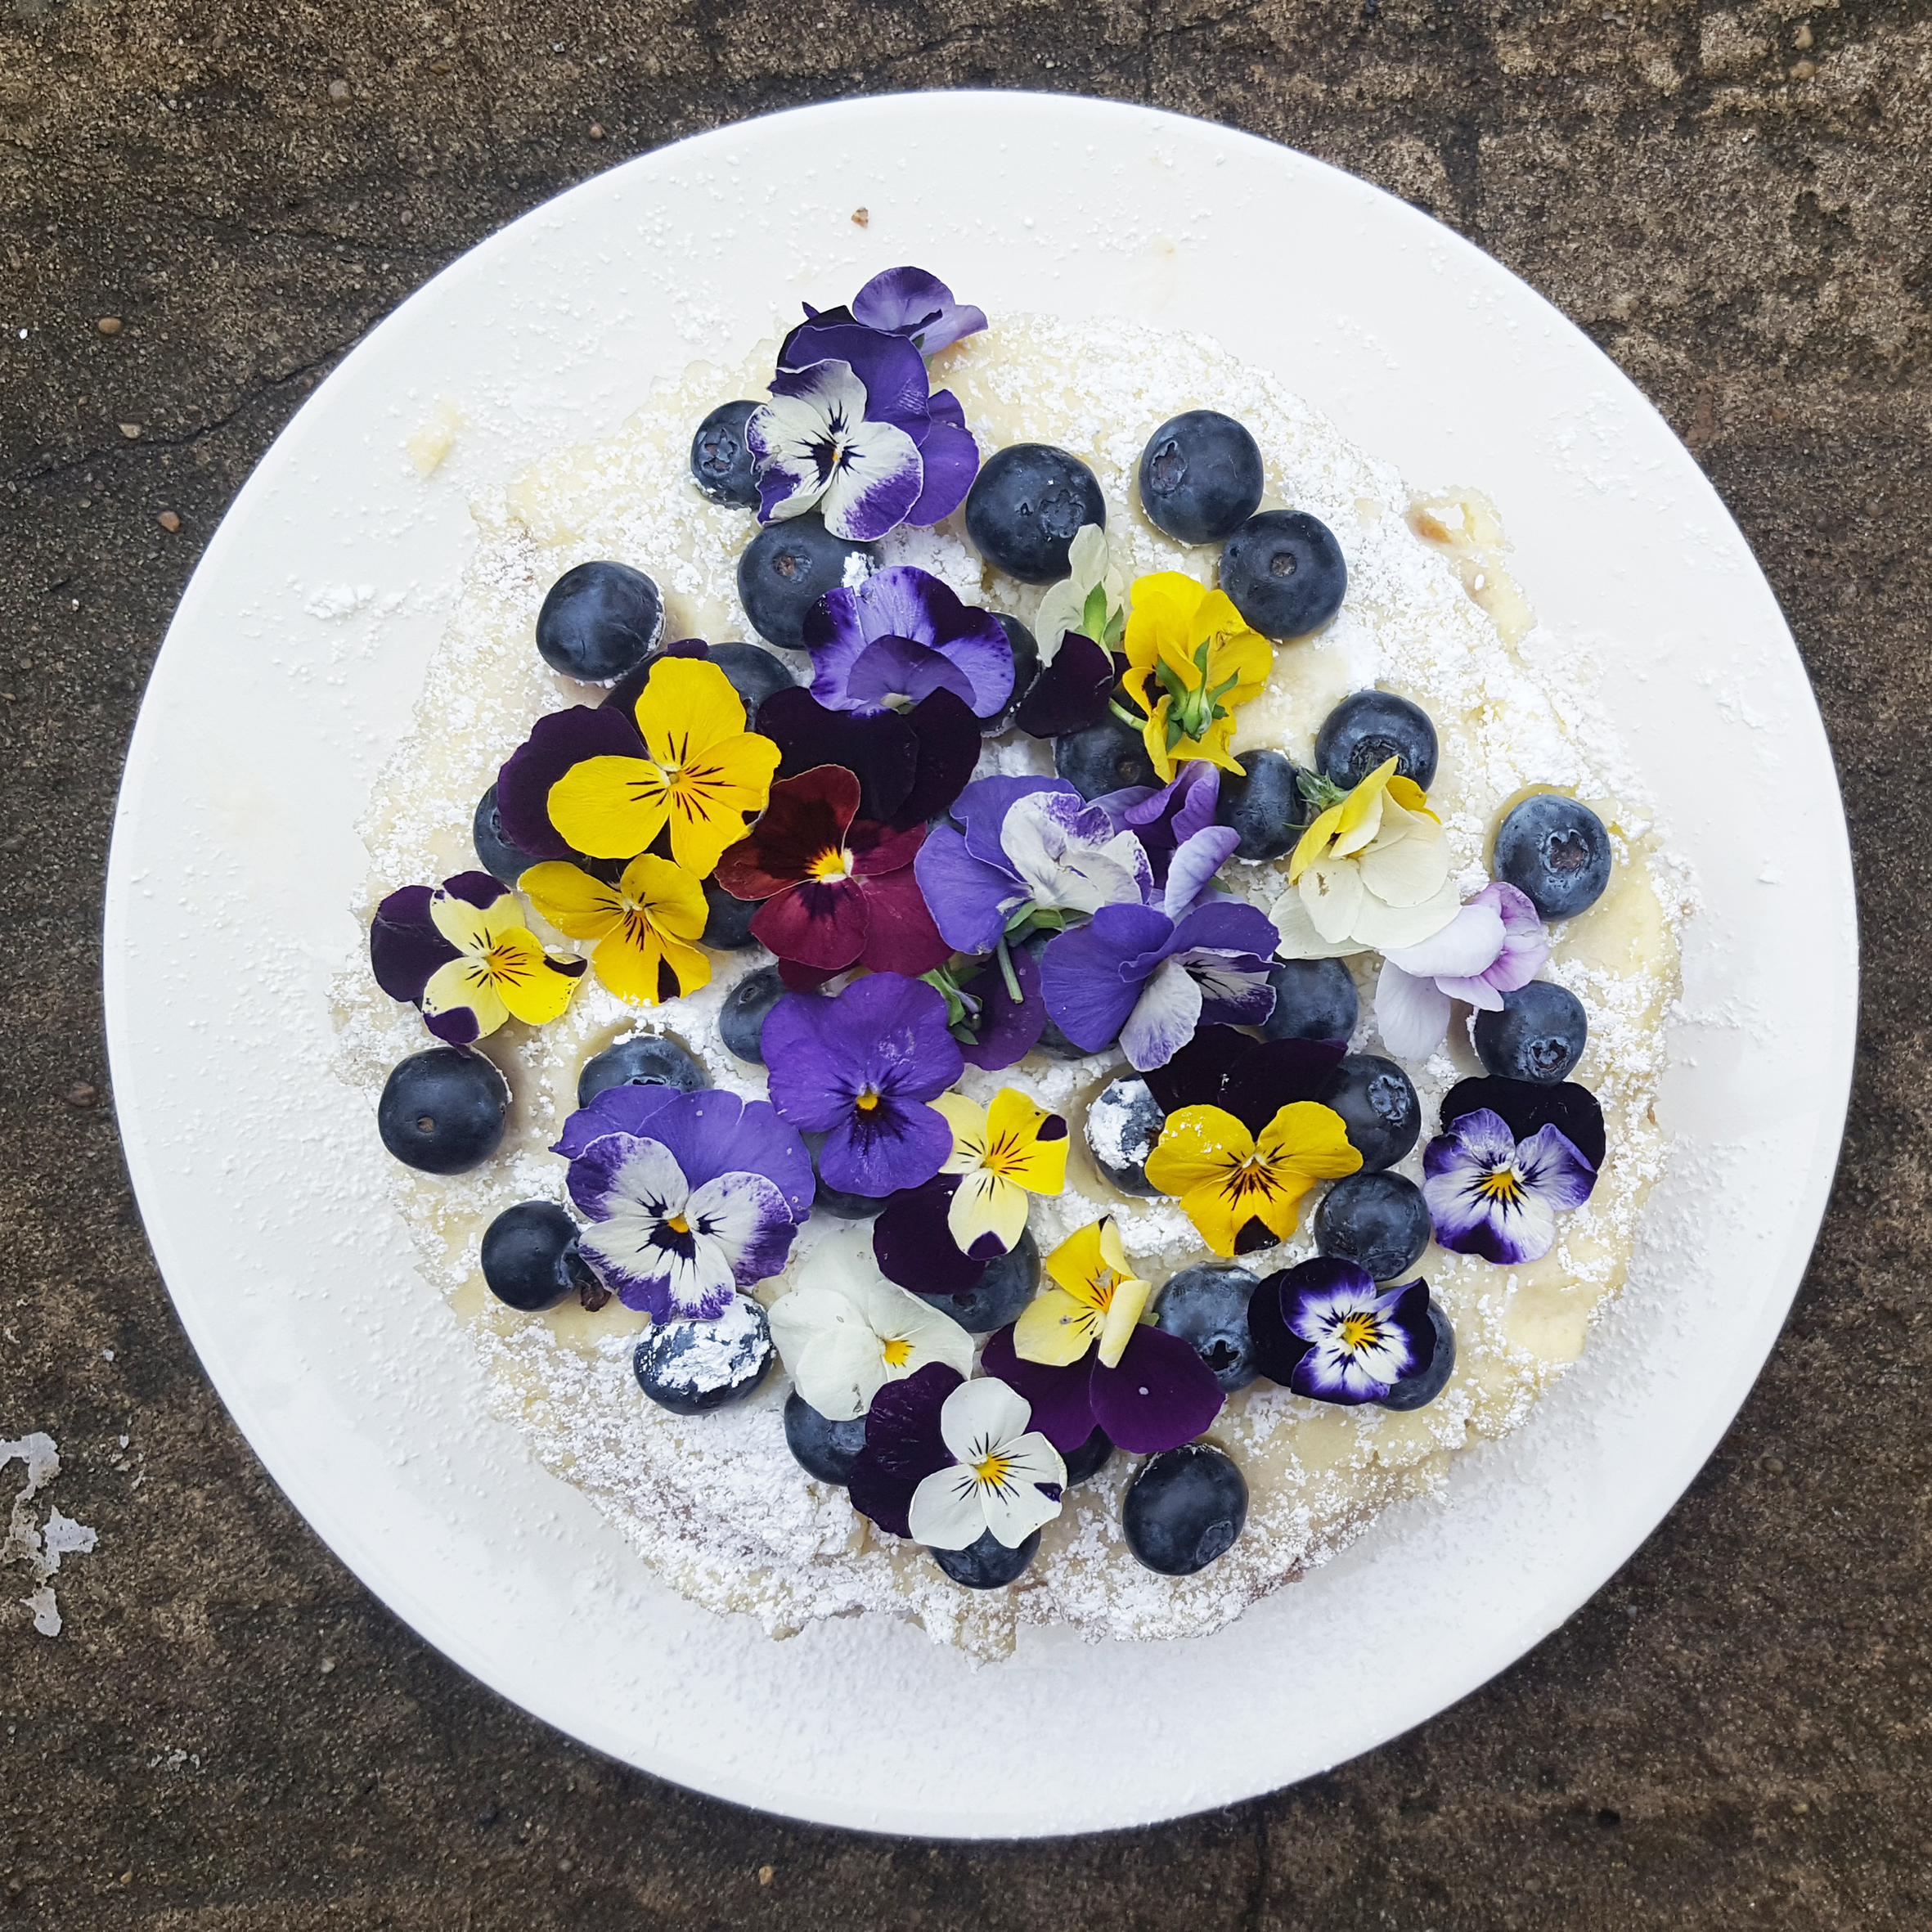 rhyl-kitchen-recipe-mrs-carters-spongecake.jpg